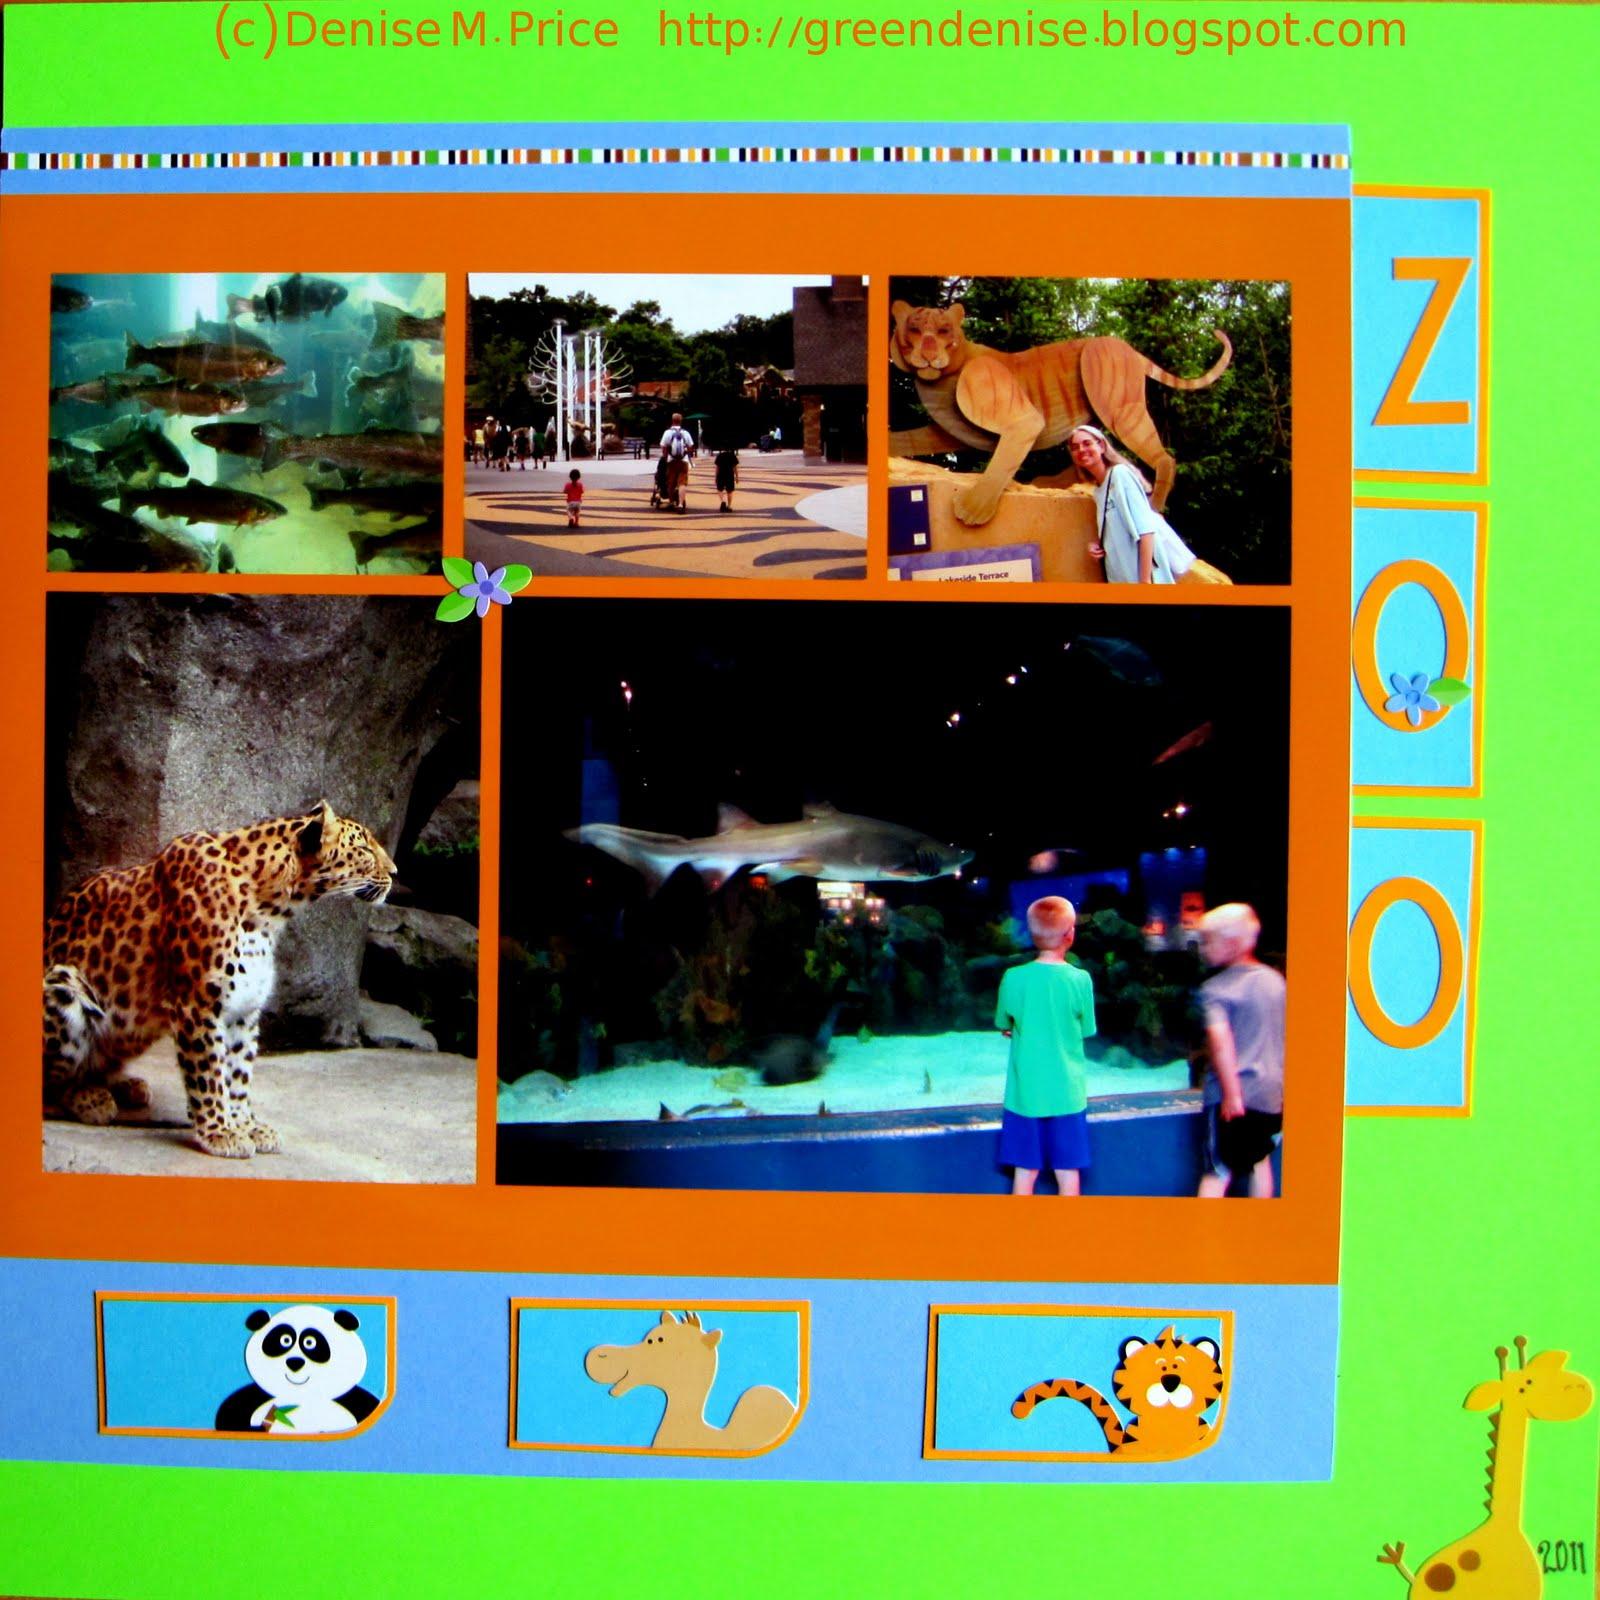 http://4.bp.blogspot.com/-HCq9QDf9PwY/Tl5QCxbG_dI/AAAAAAAAAOQ/4sCTyao0Ejs/s1600/zoo1.jpg